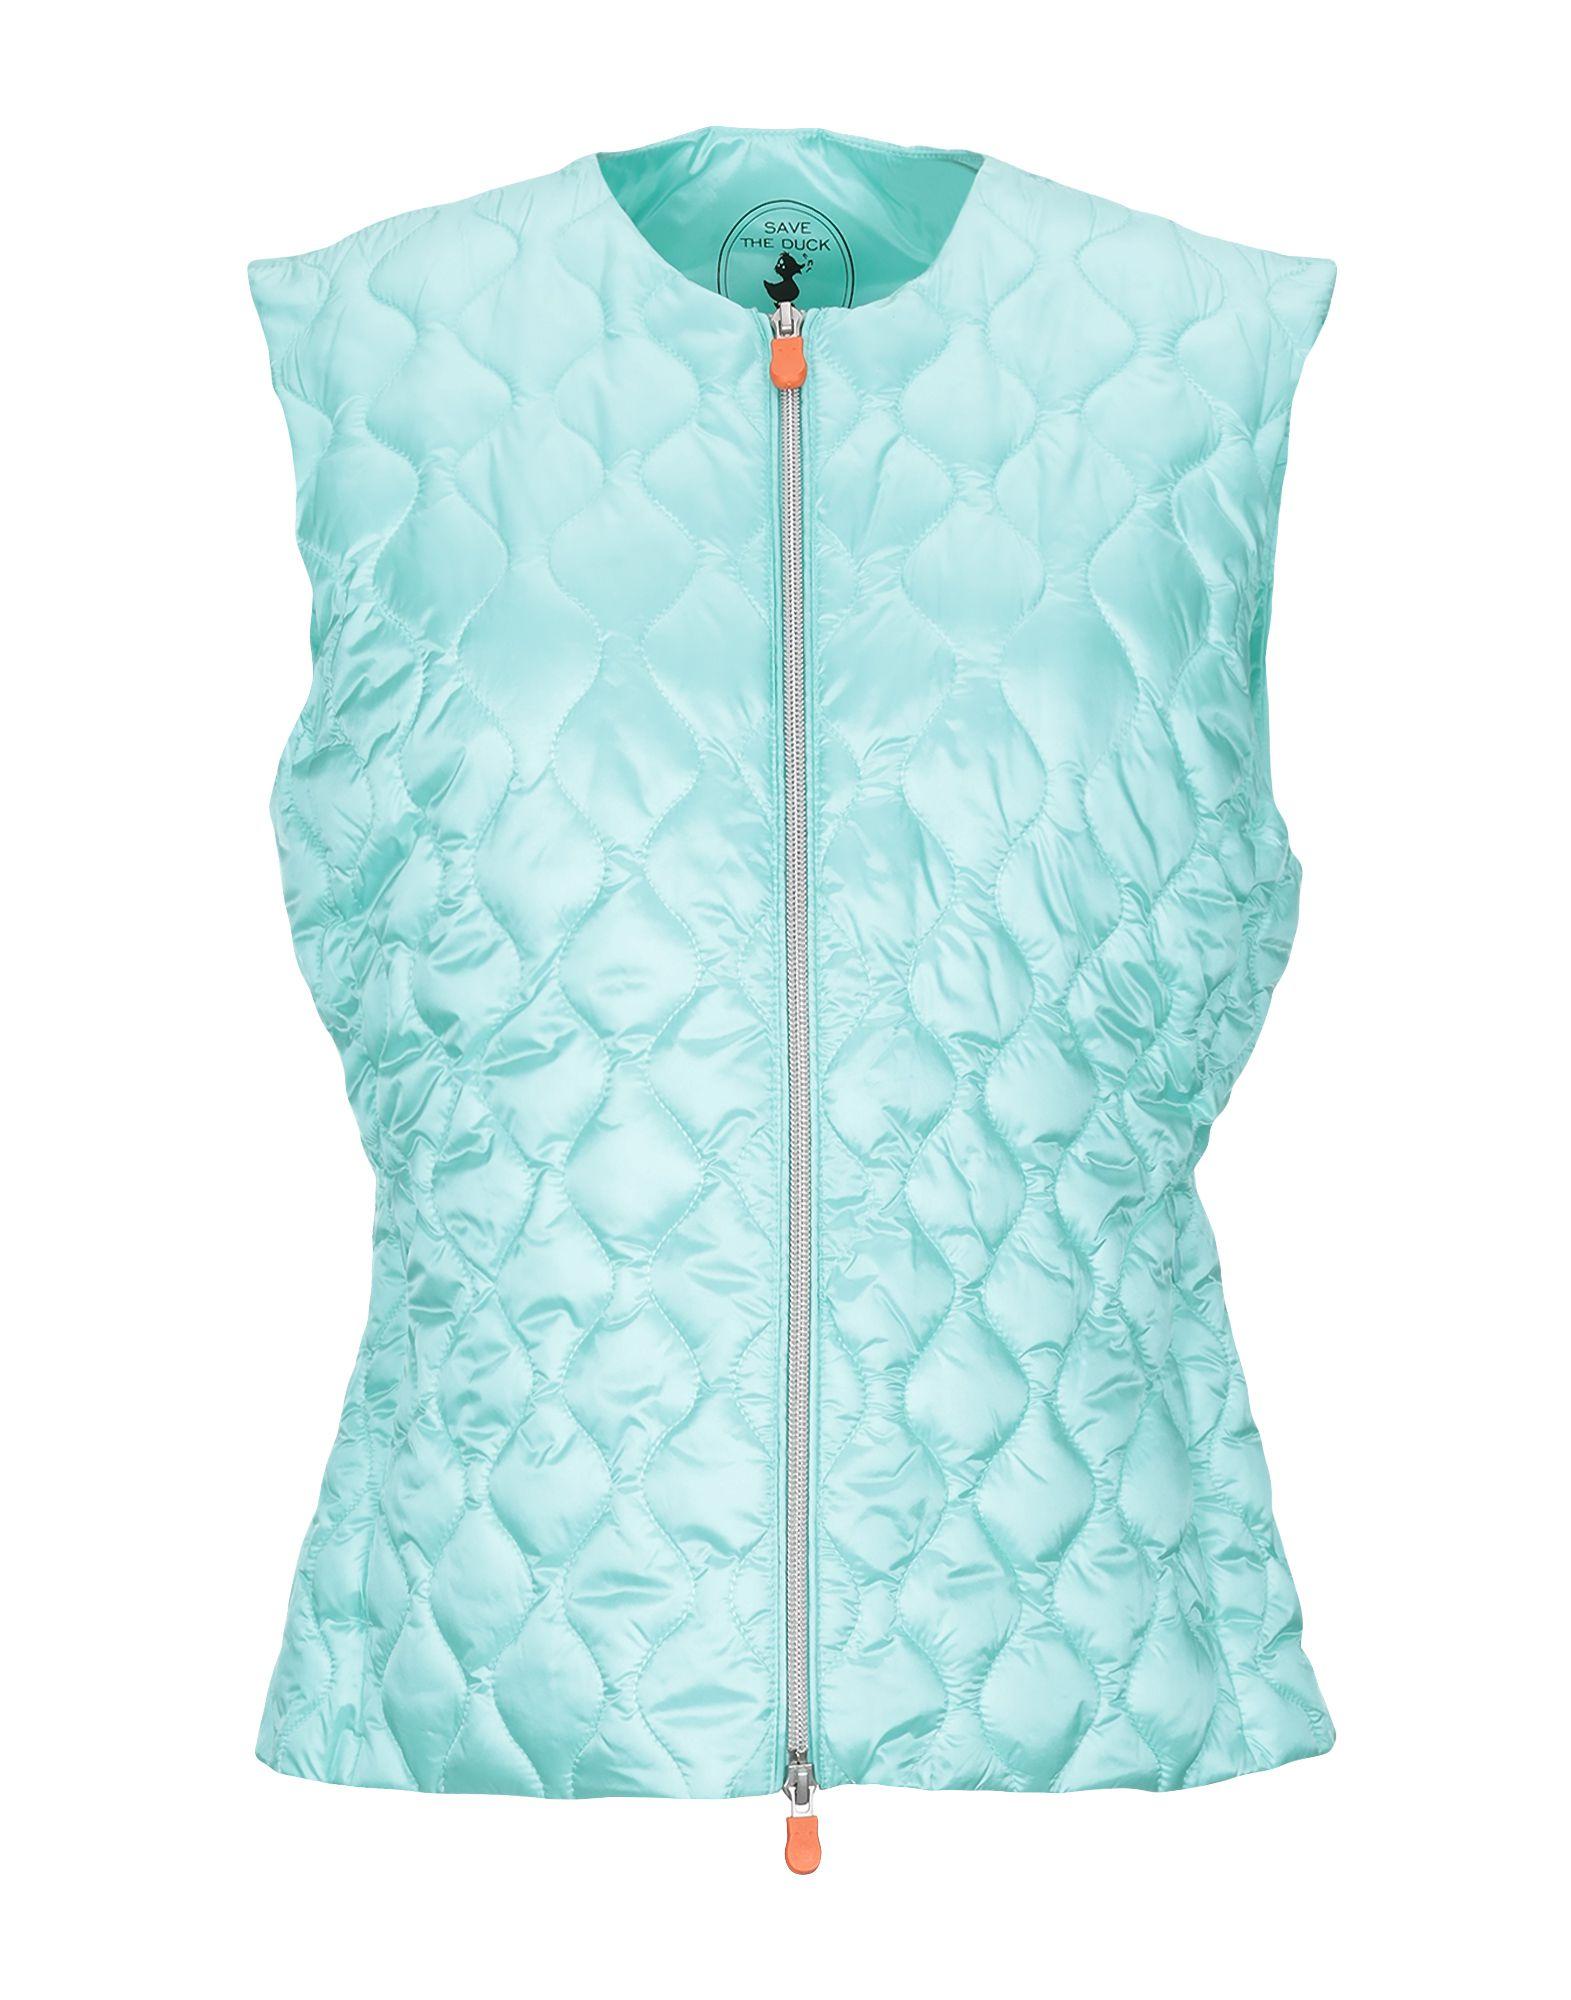 on sale 30697 da79e Down & Puffer - Buy Best Down & Puffer from Fashion Influencers | Brick &  Portal